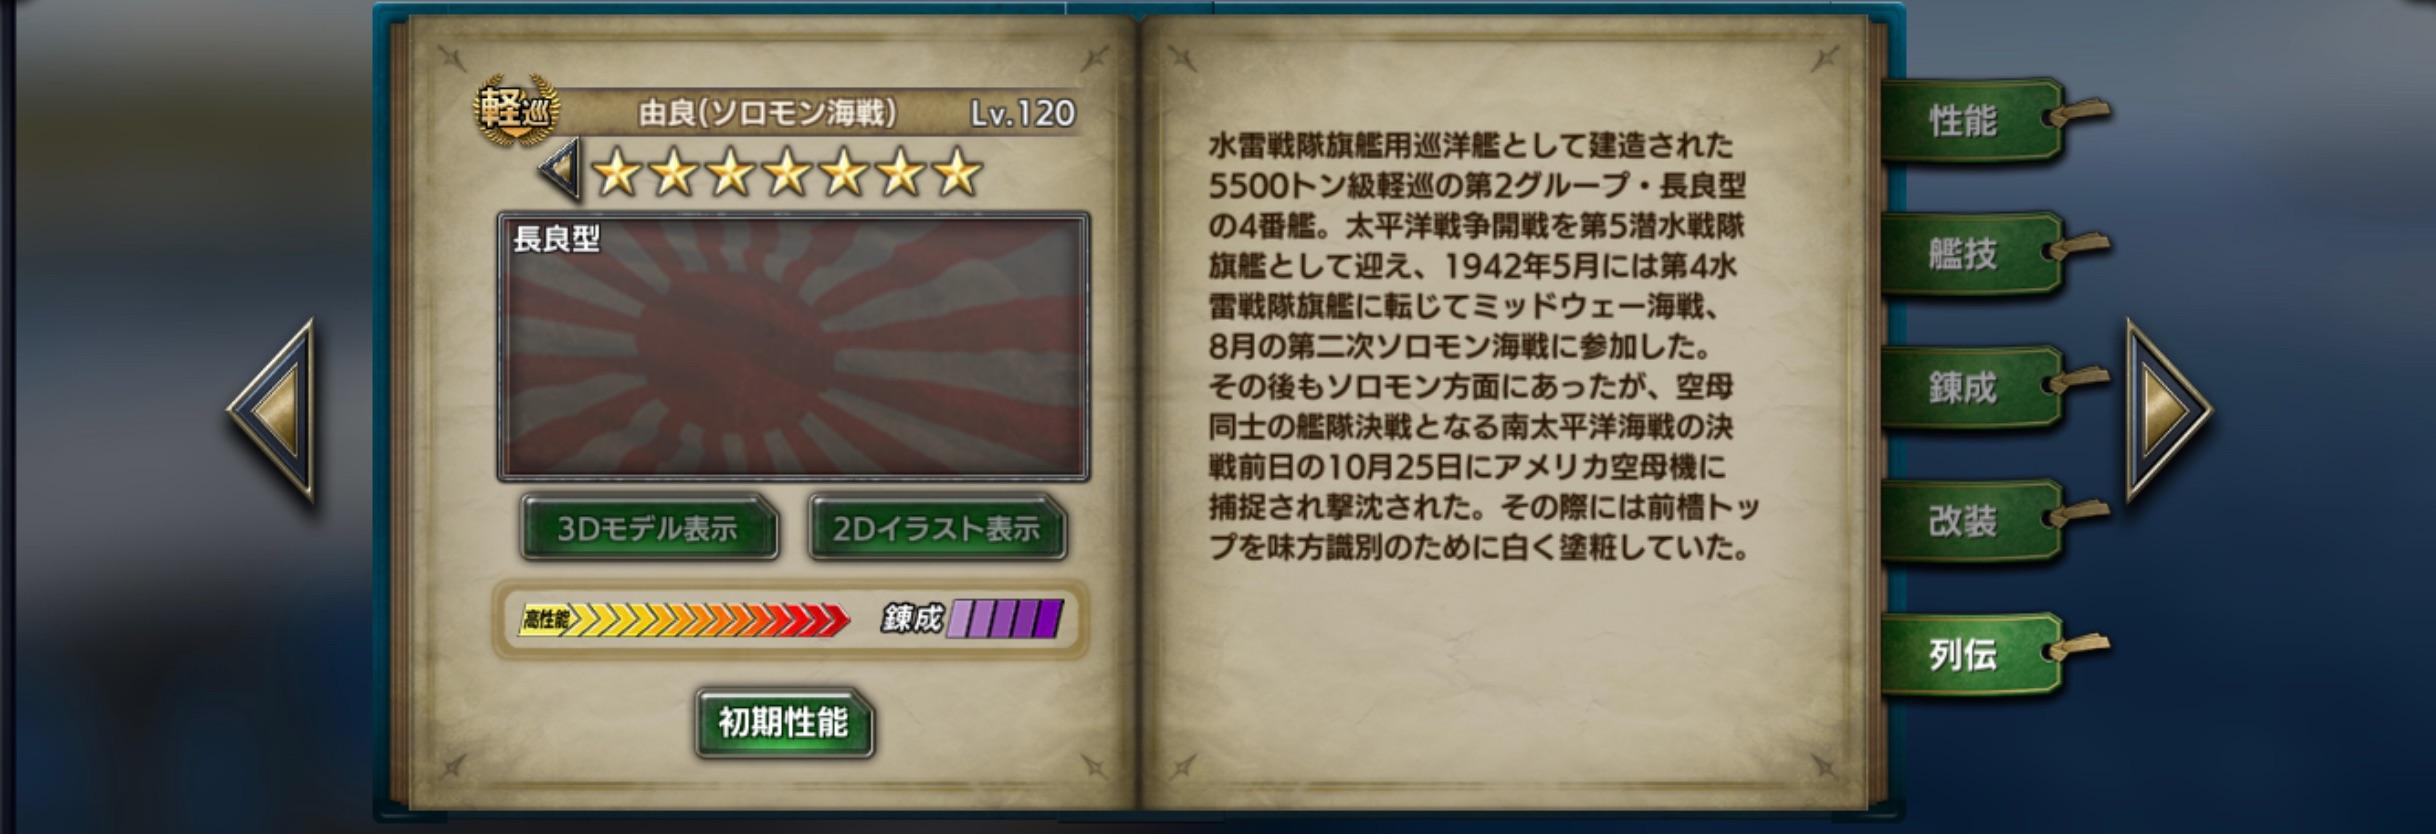 YuraS-history